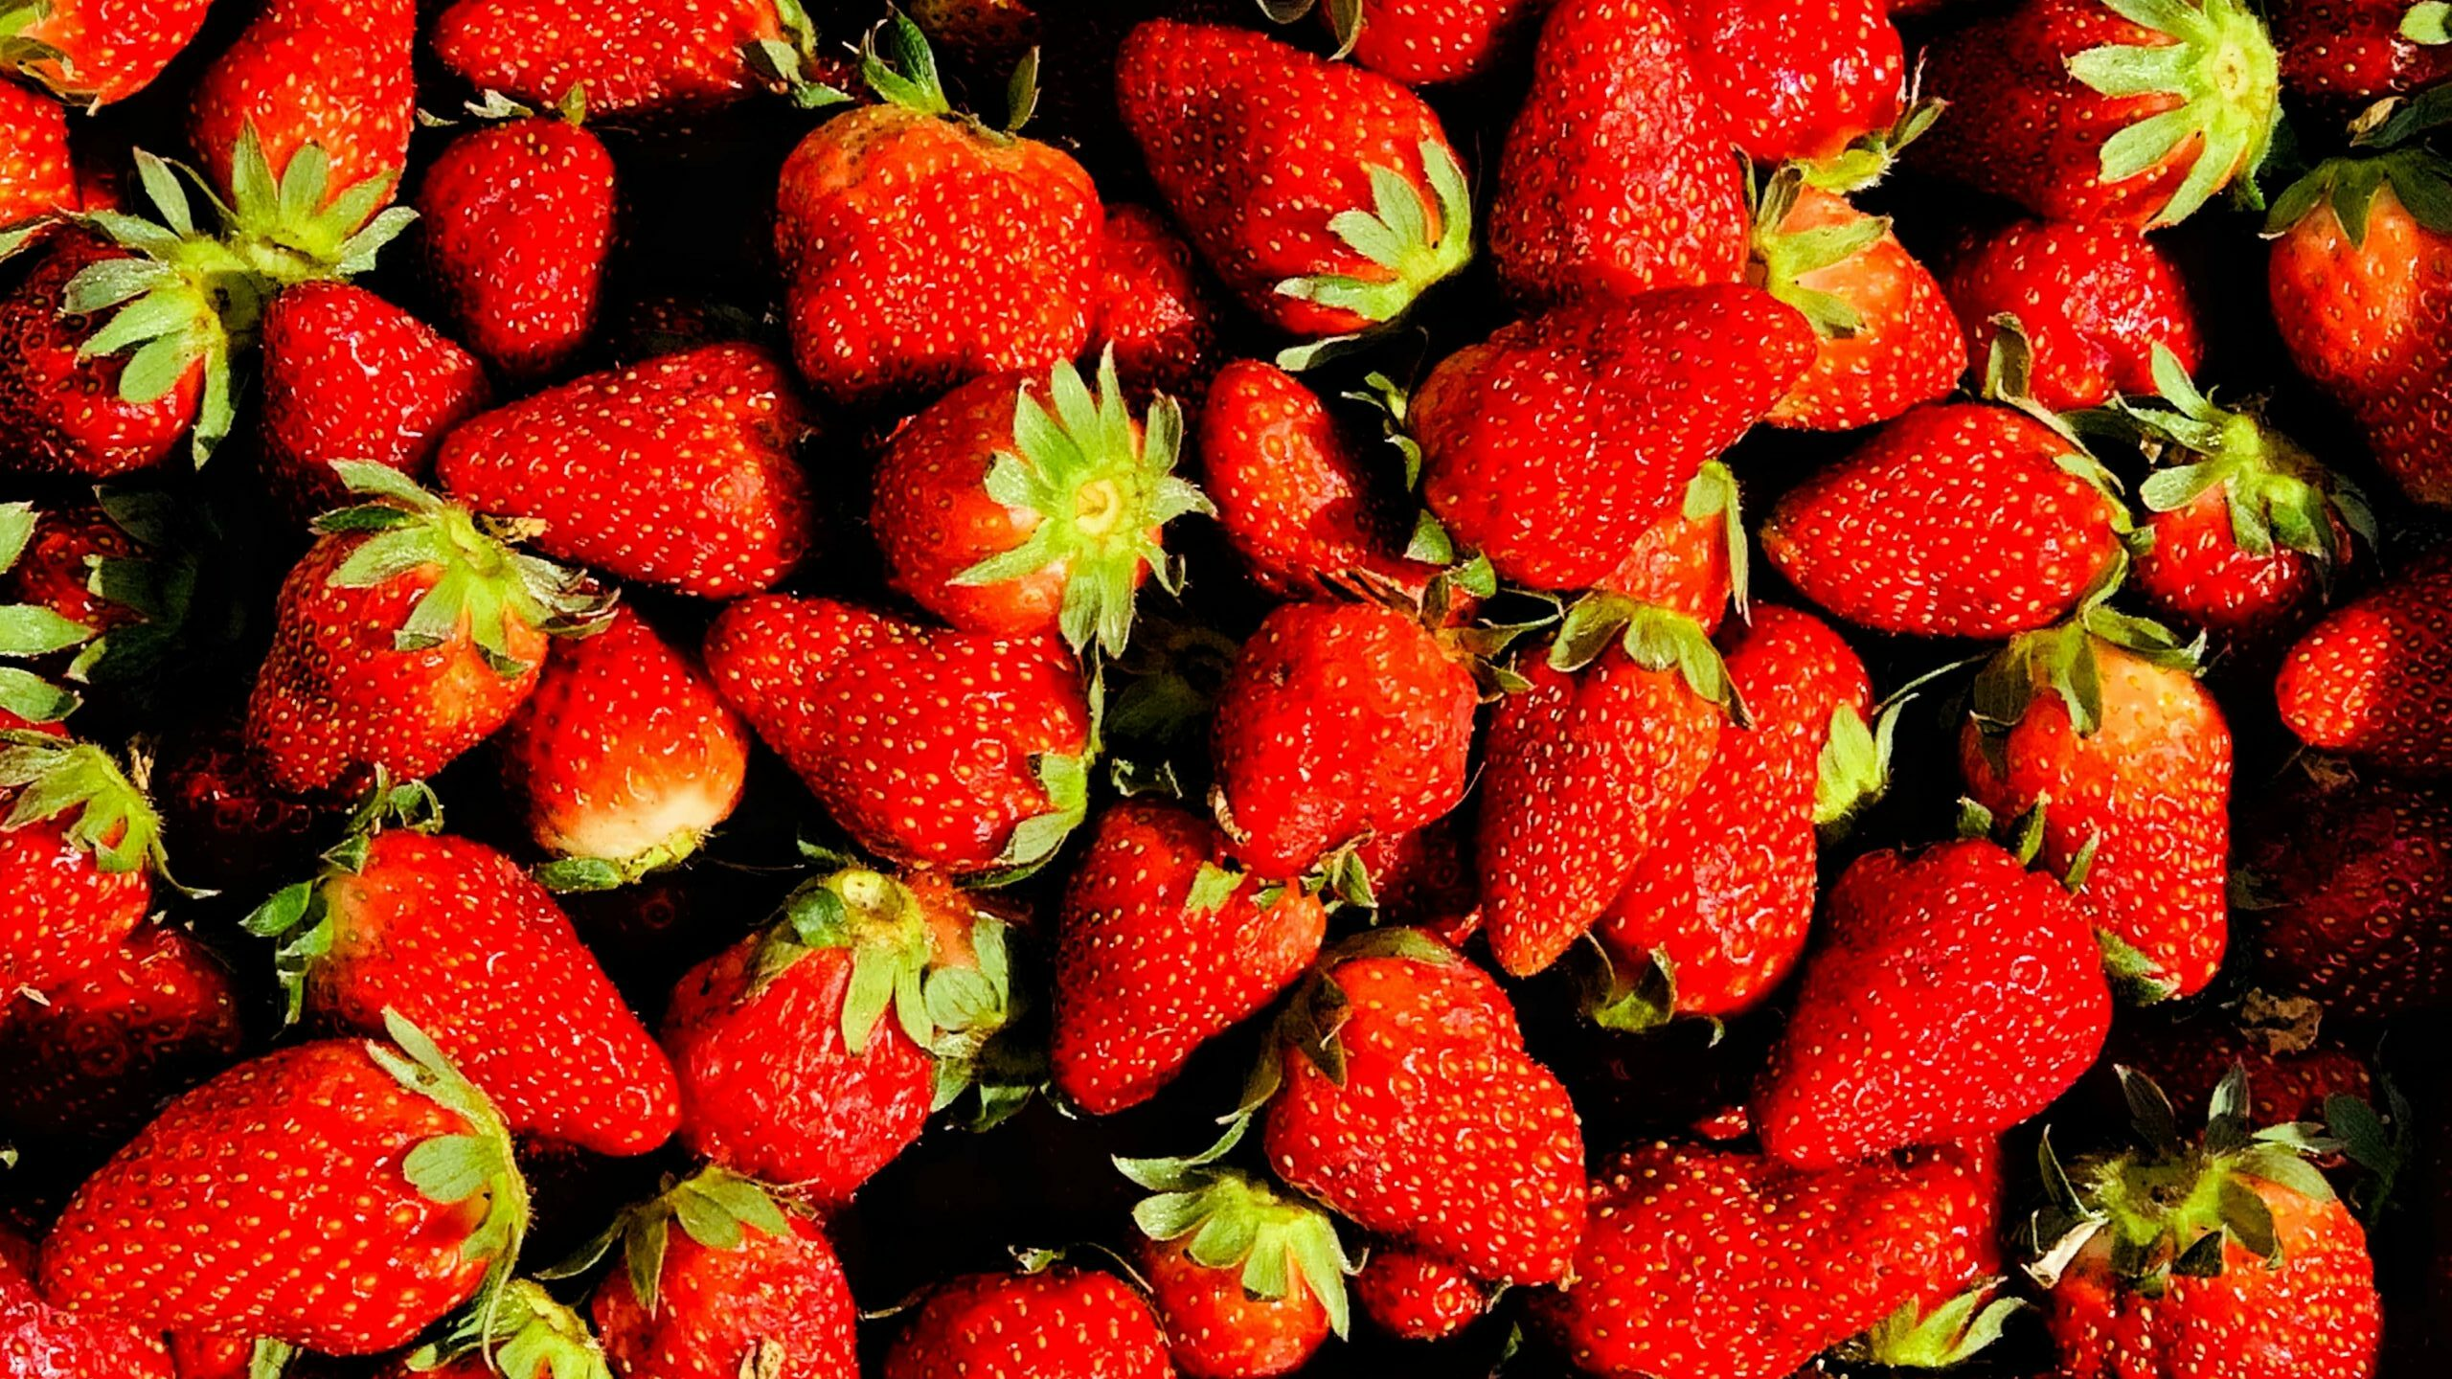 assortment of red strawberries